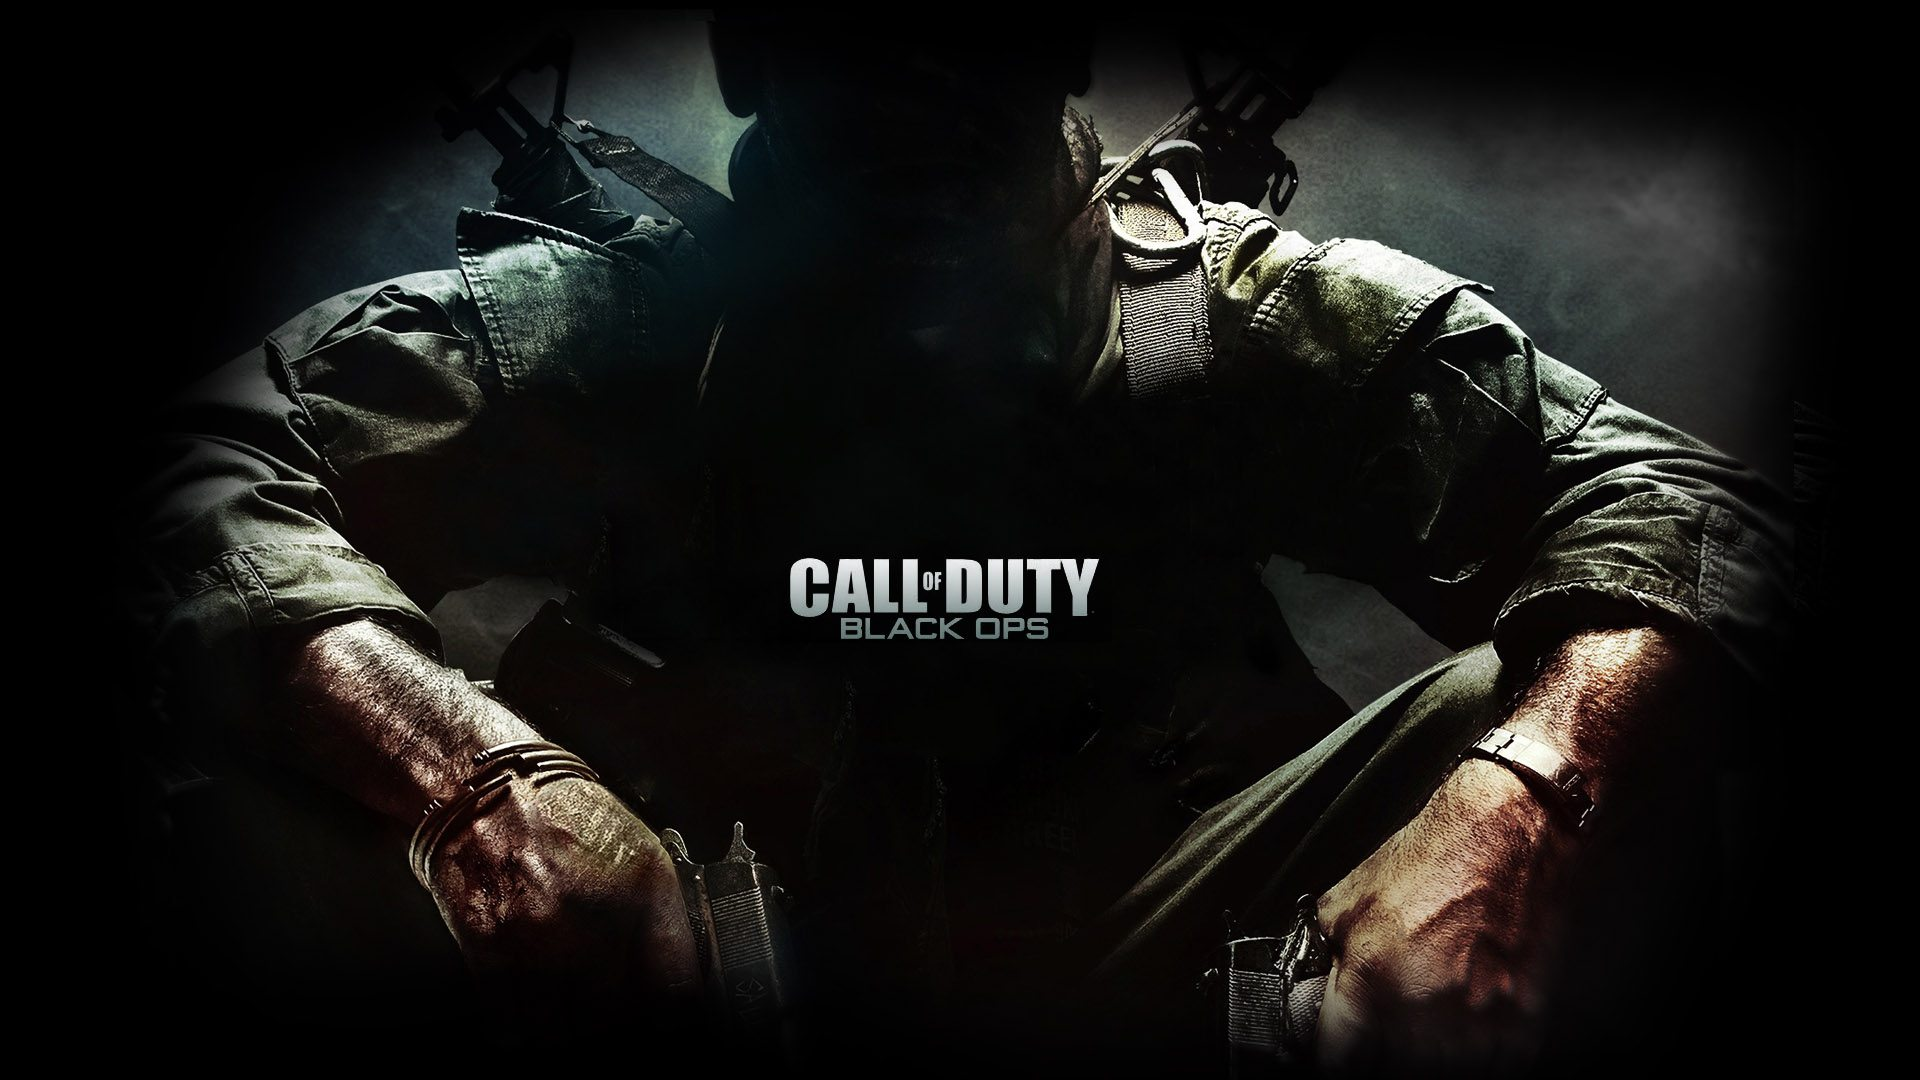 call-of-duty-black-ops-gamesoul-2